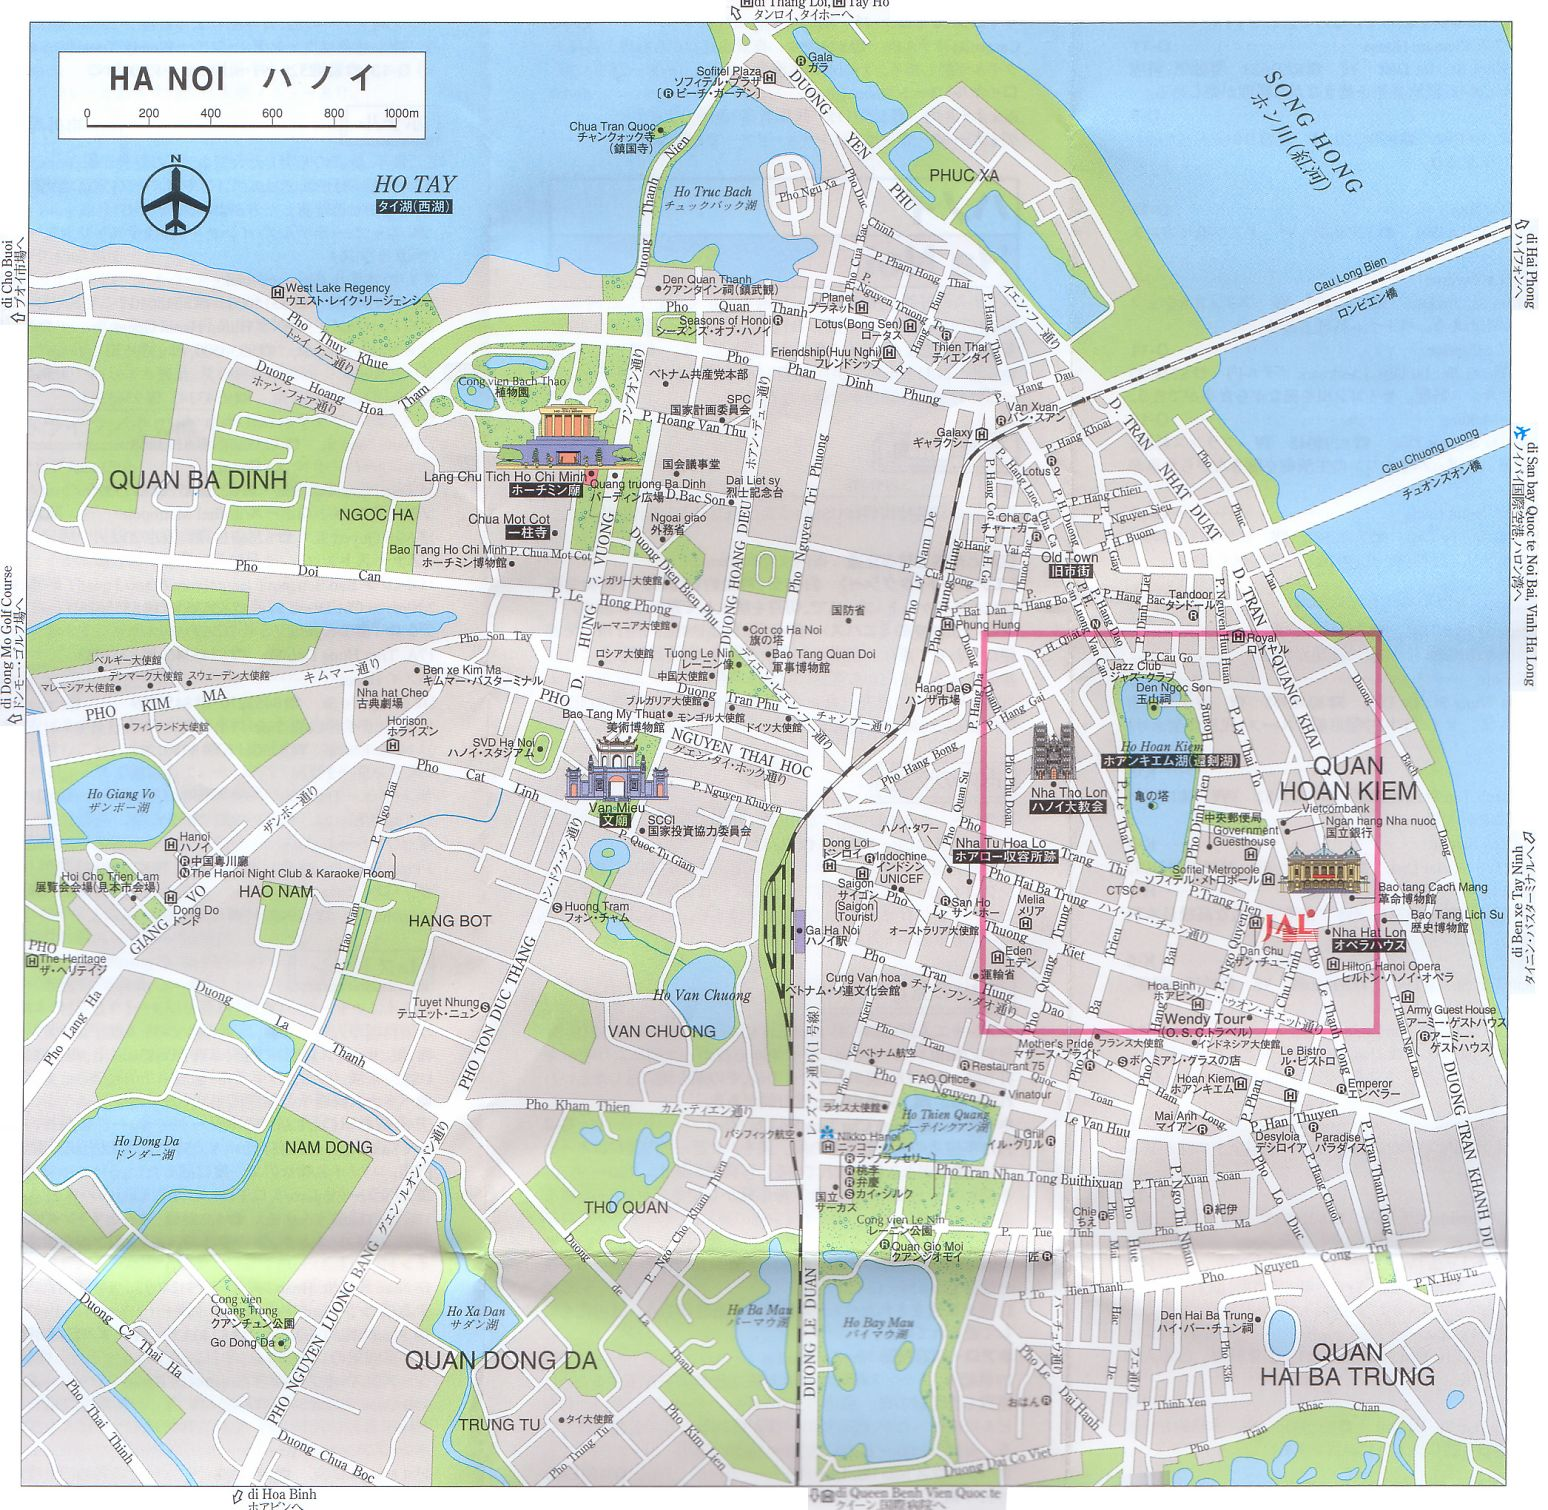 Hanoi Vietnam City Map